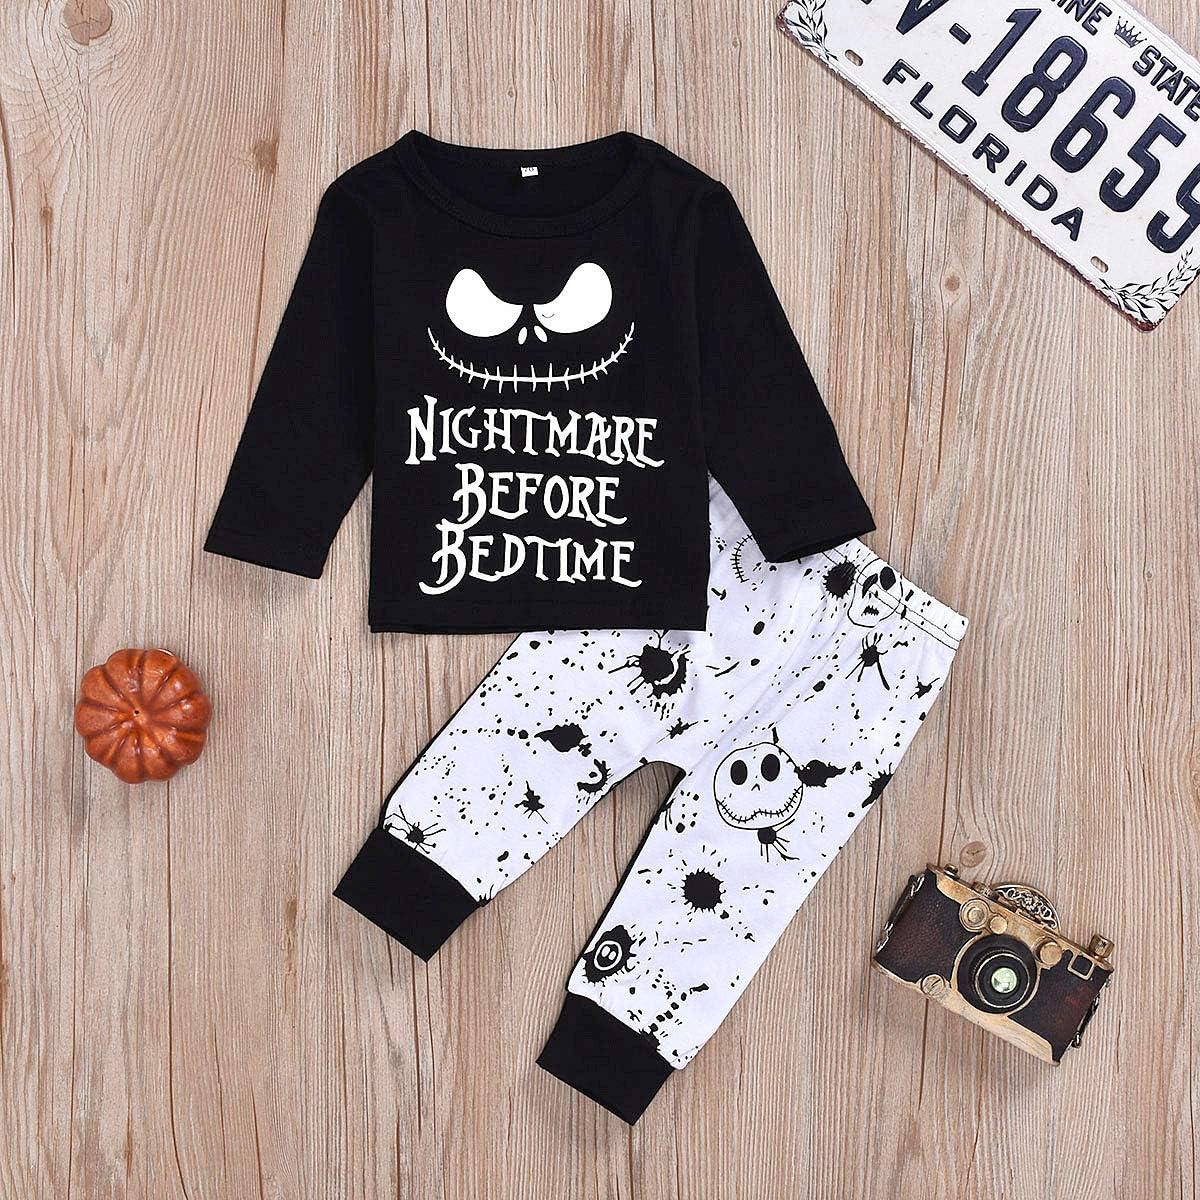 DaceStar Newborn Baby Boys Pajamas 0-3T Clothes 2PCs Outfits Nightmare Printing Long Sleeve Skull Pants Set